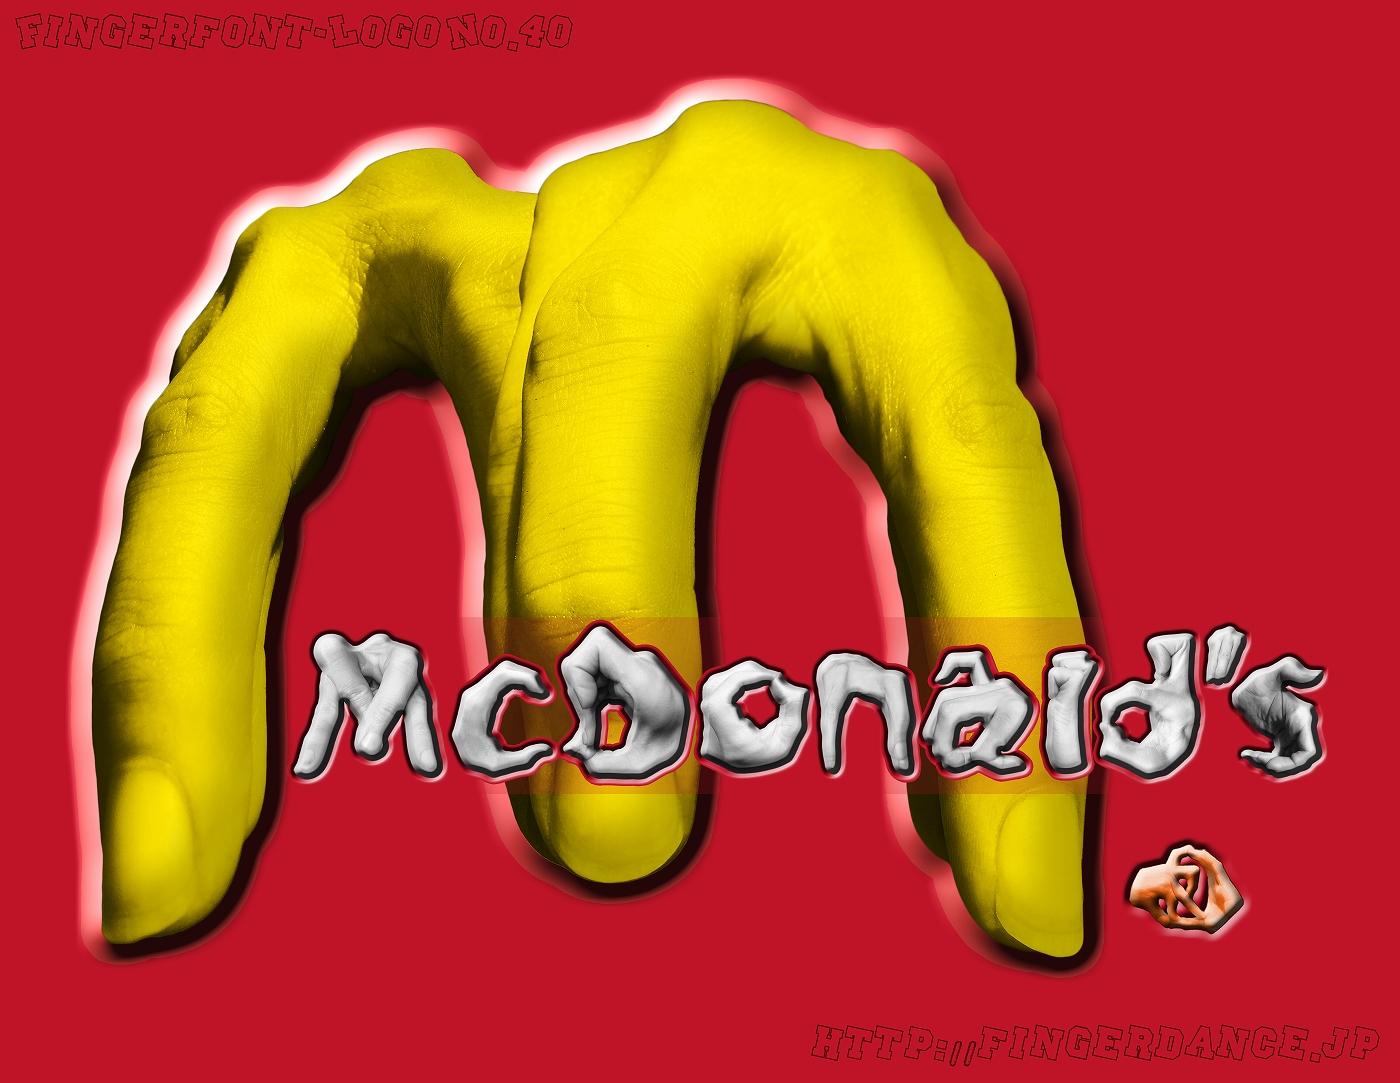 McDnald's-fingerhttp://fingerdance.jp/L/logohand マクドナルド・フィンガーロゴハンド手指字